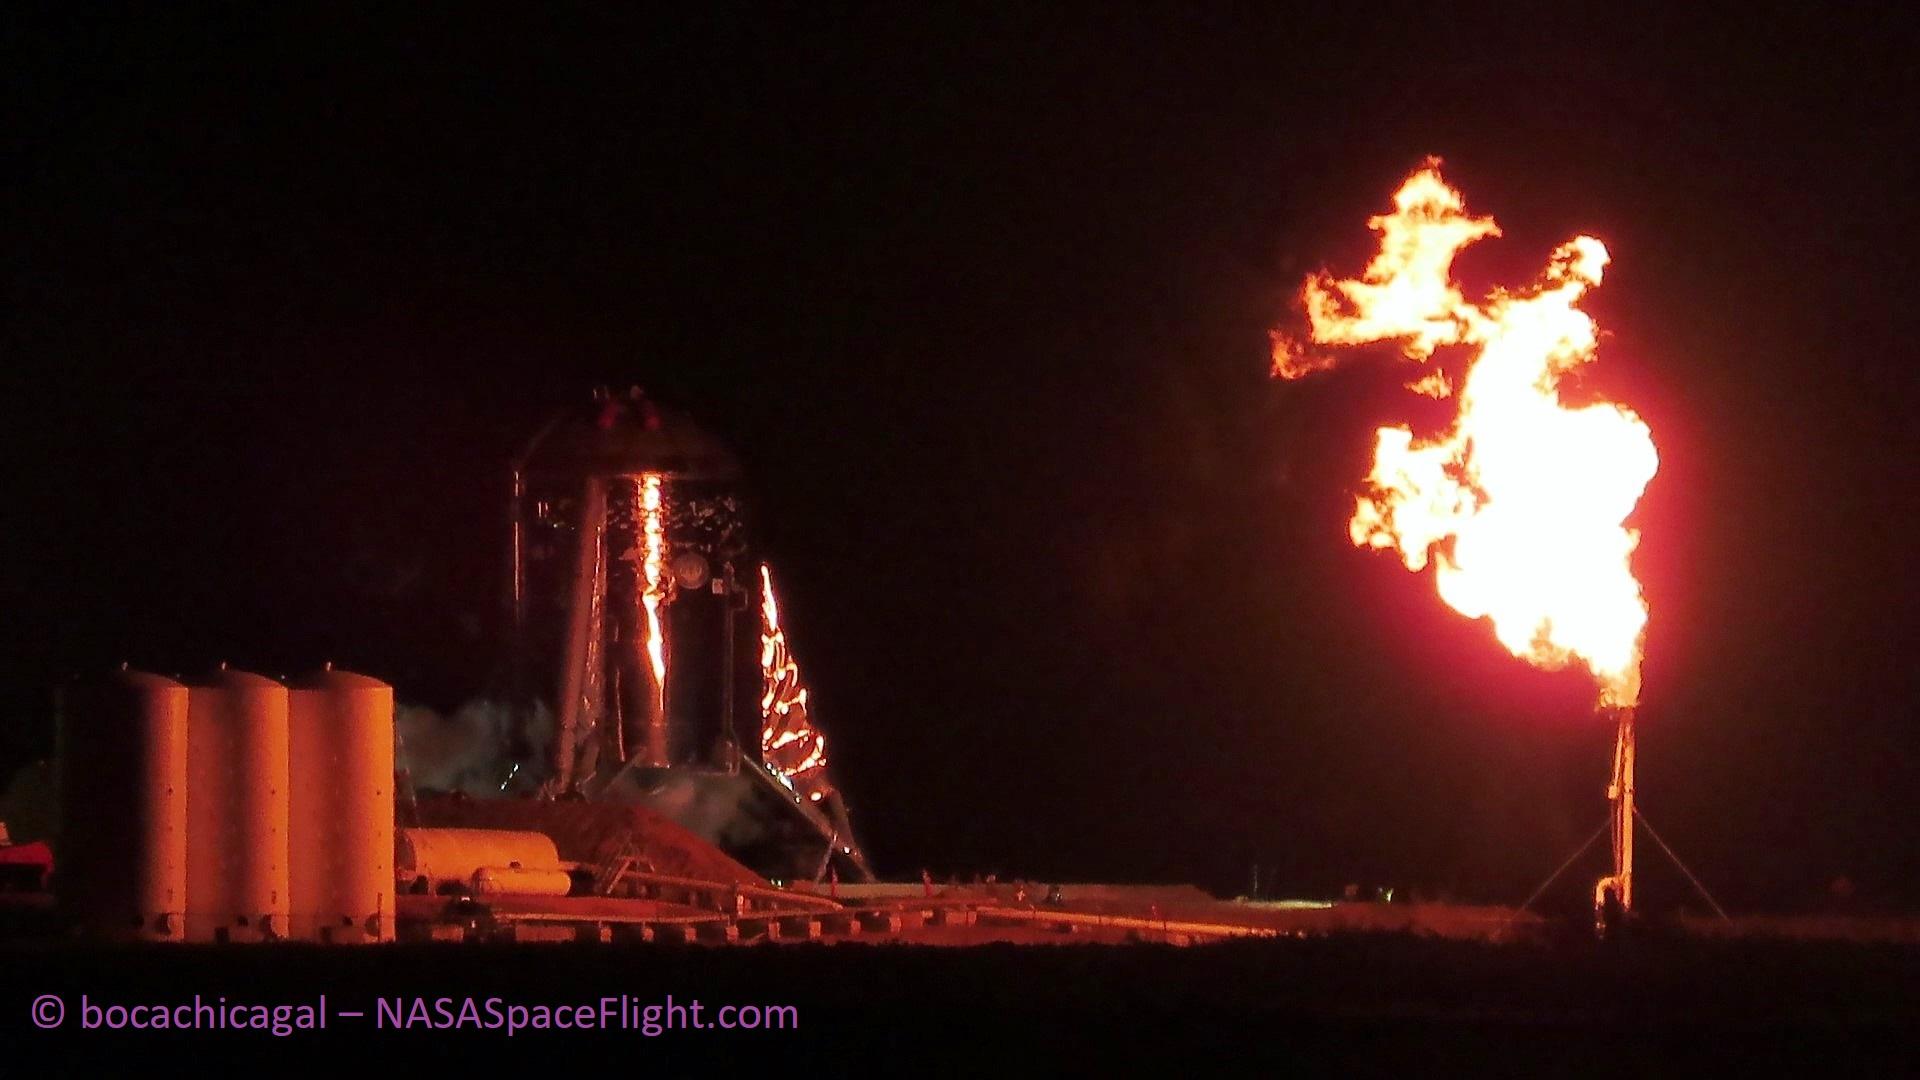 Boca Chica Starhopper testing 040219 (NASASpaceflight – bocachicagal) 1